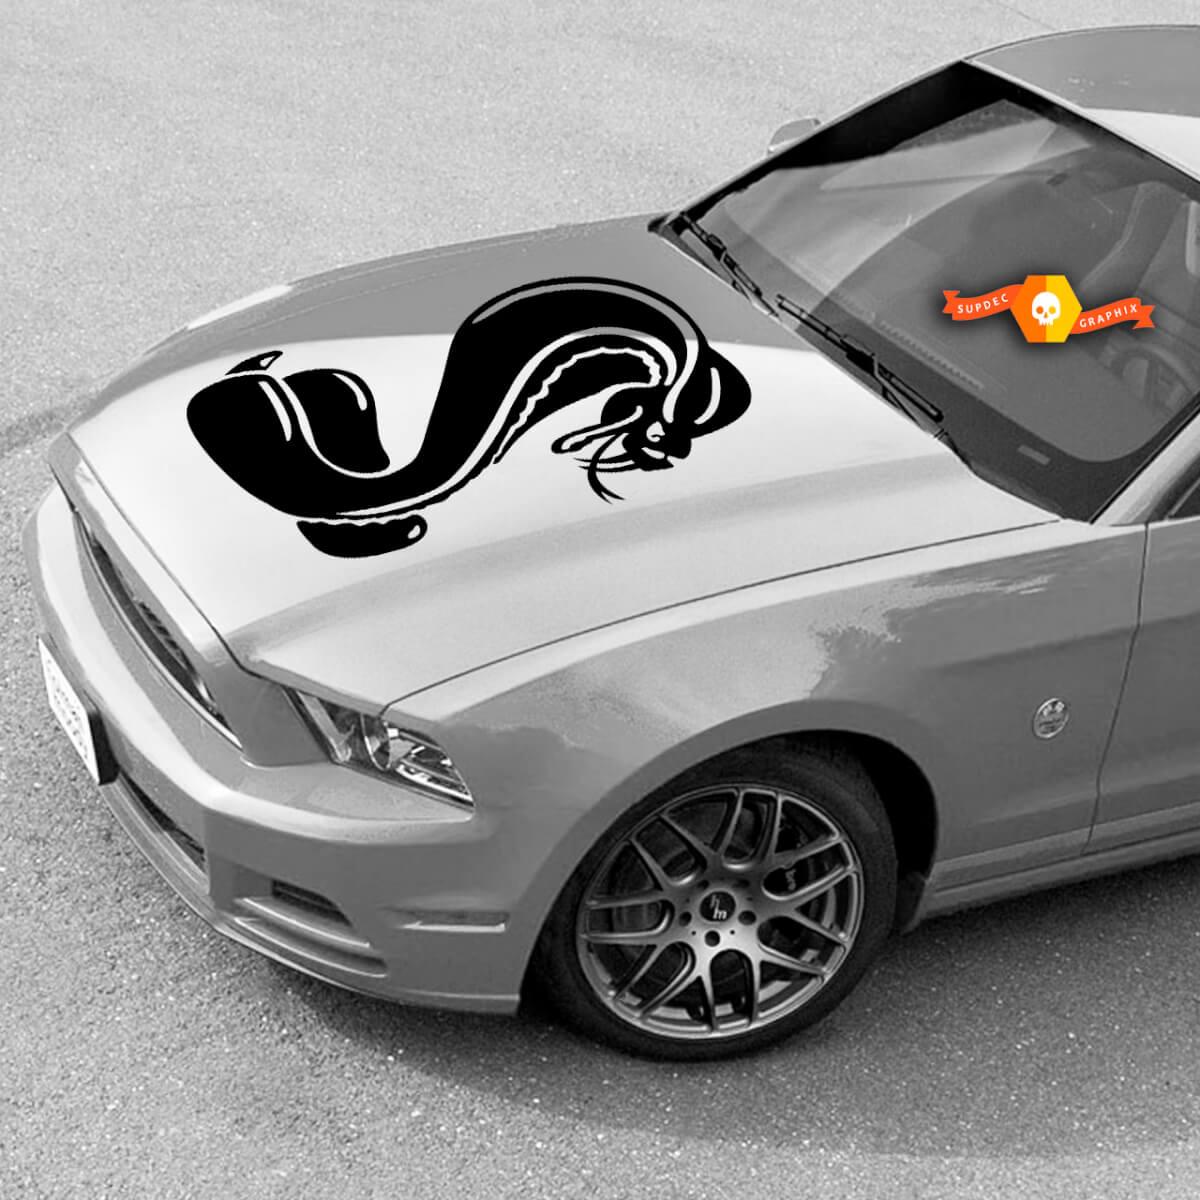 Mustang Cobra Snake Scoop Große Motorhaube Vintage Grunge Hood Tür Auto Bett Pickup Fahrzeug LKW Vinyl Grafik Aufkleber Heckklappe